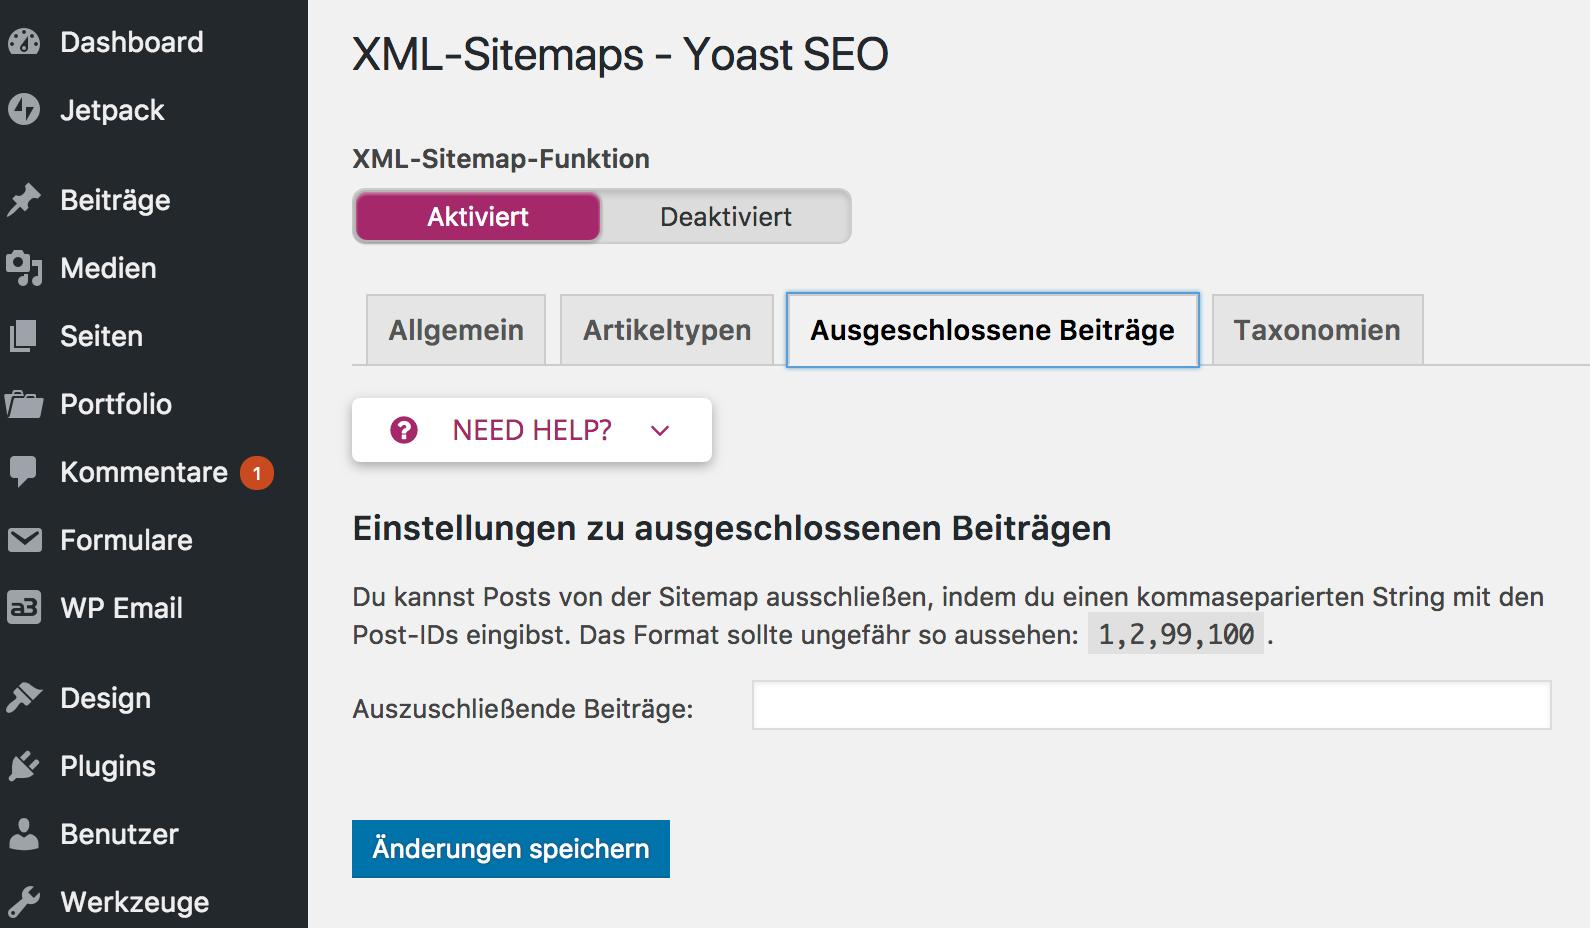 Yoast SEO XML Sitemaps - ausgeschlossene Beiträge